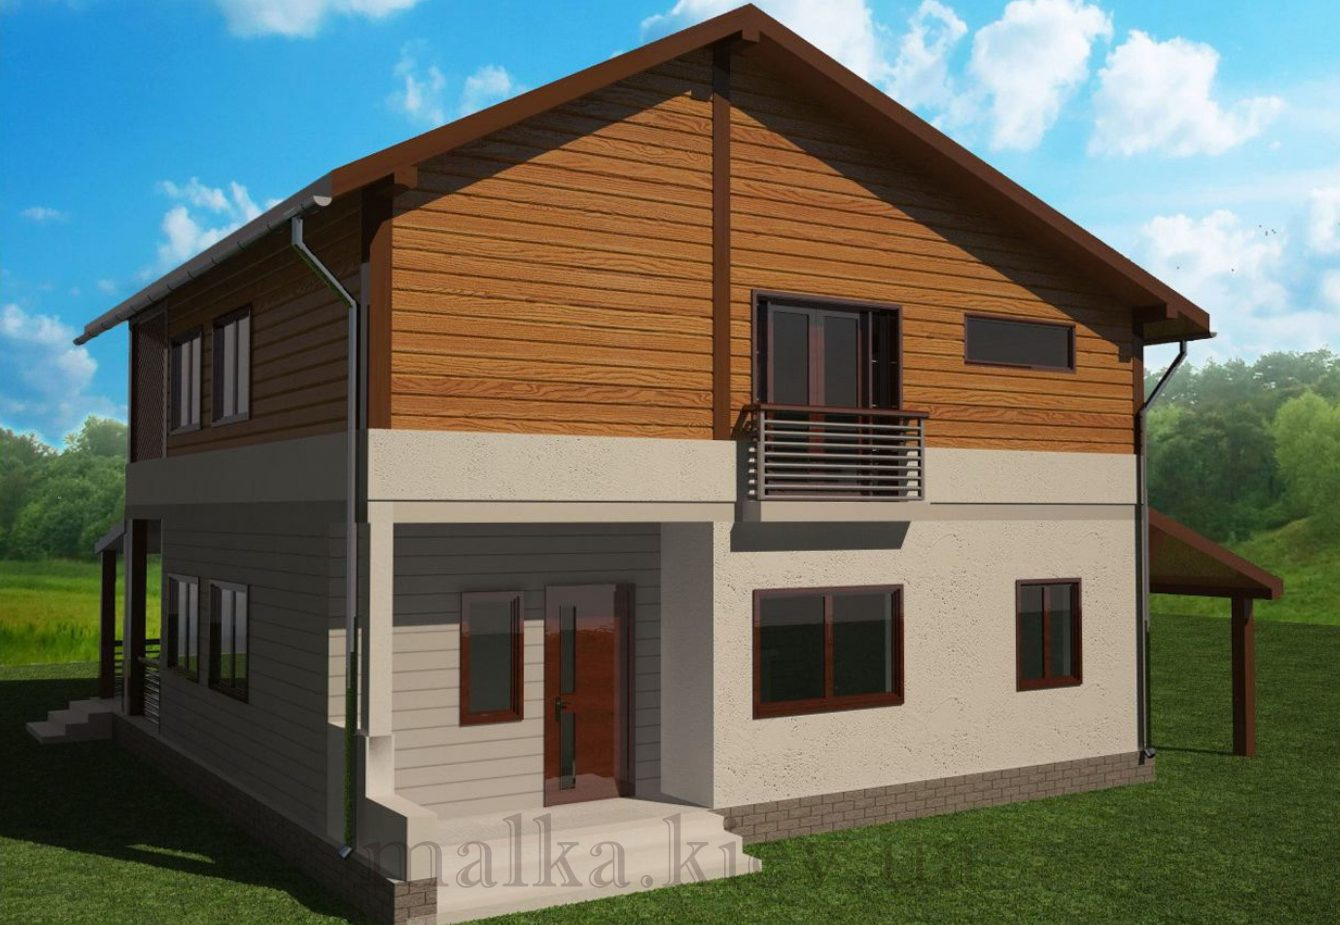 Проект жилого дома №66